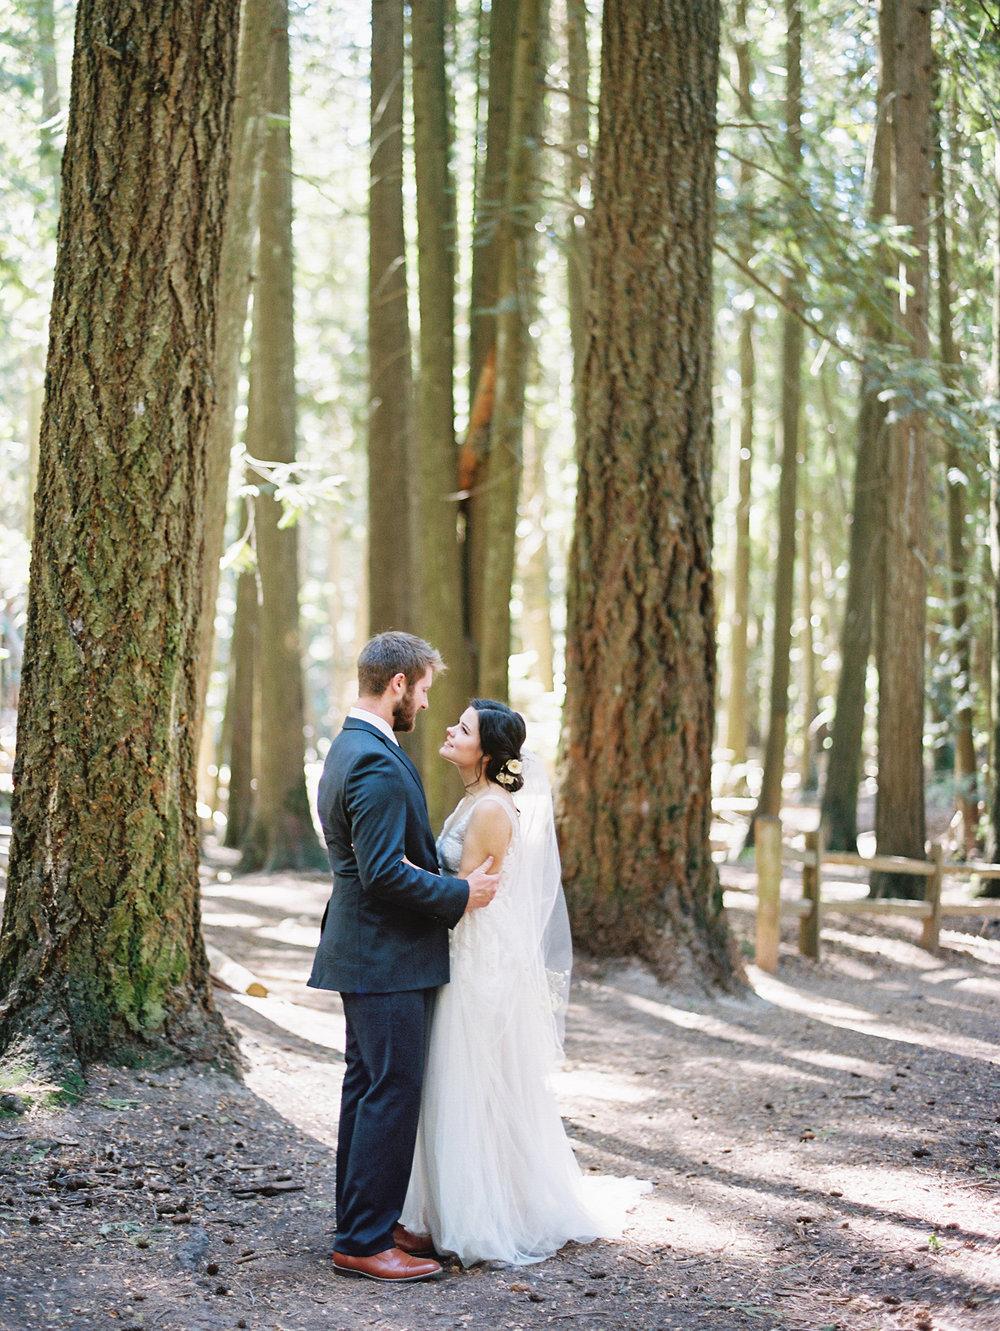 Idaho-Field-Forest-Wedding-Film-Photographer-Kristina-Adams-141.jpg